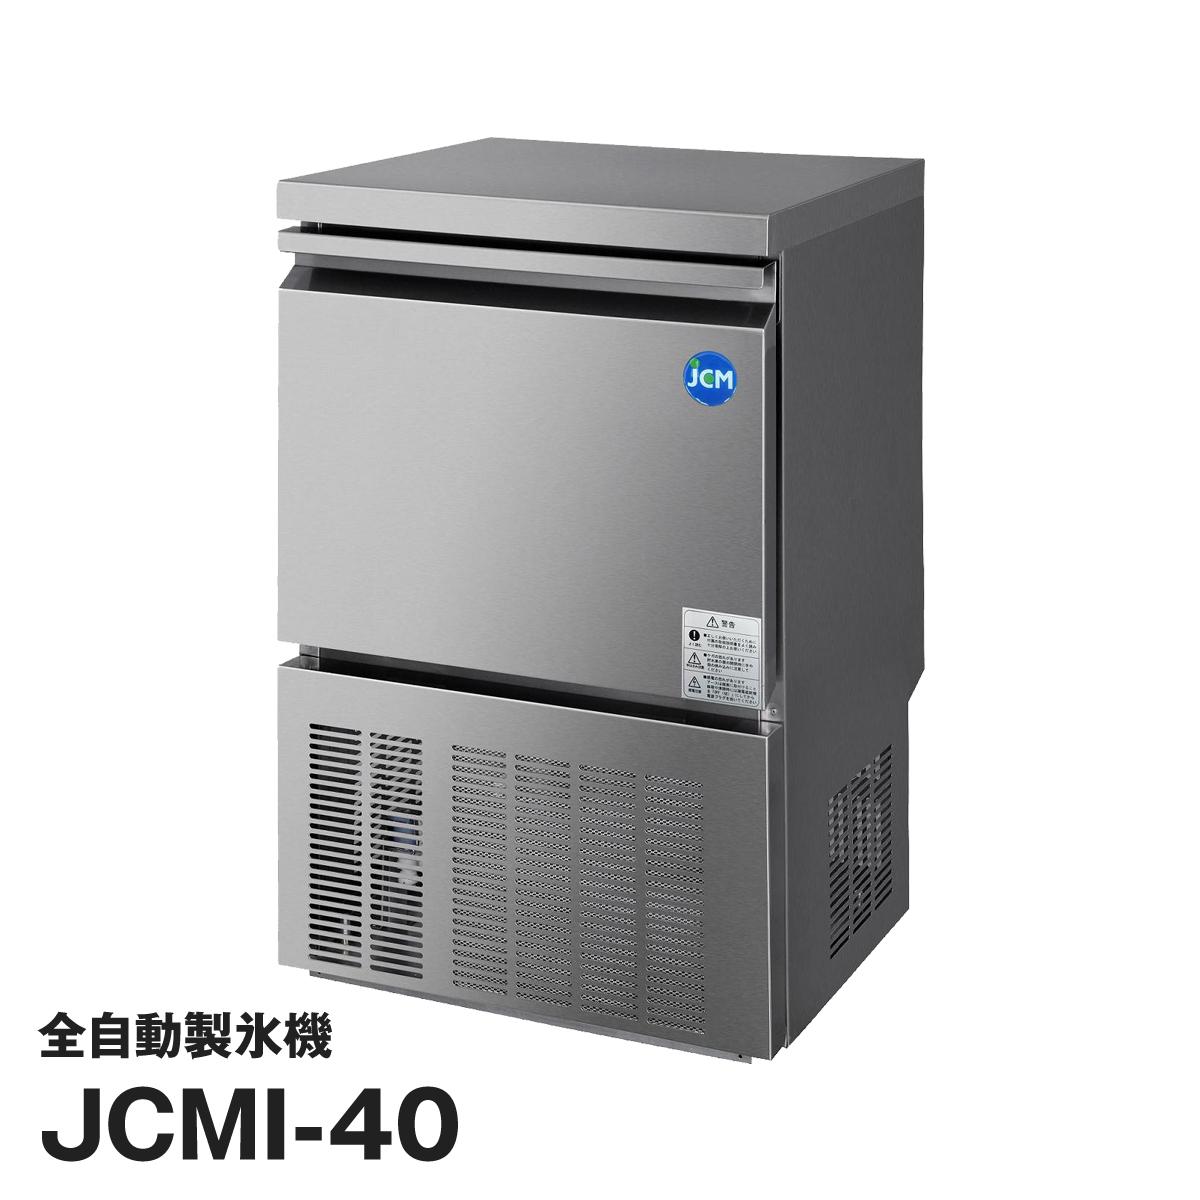 JCM社製 業務用 全自動製氷機 製氷能力 40kg JCMI-40 新品